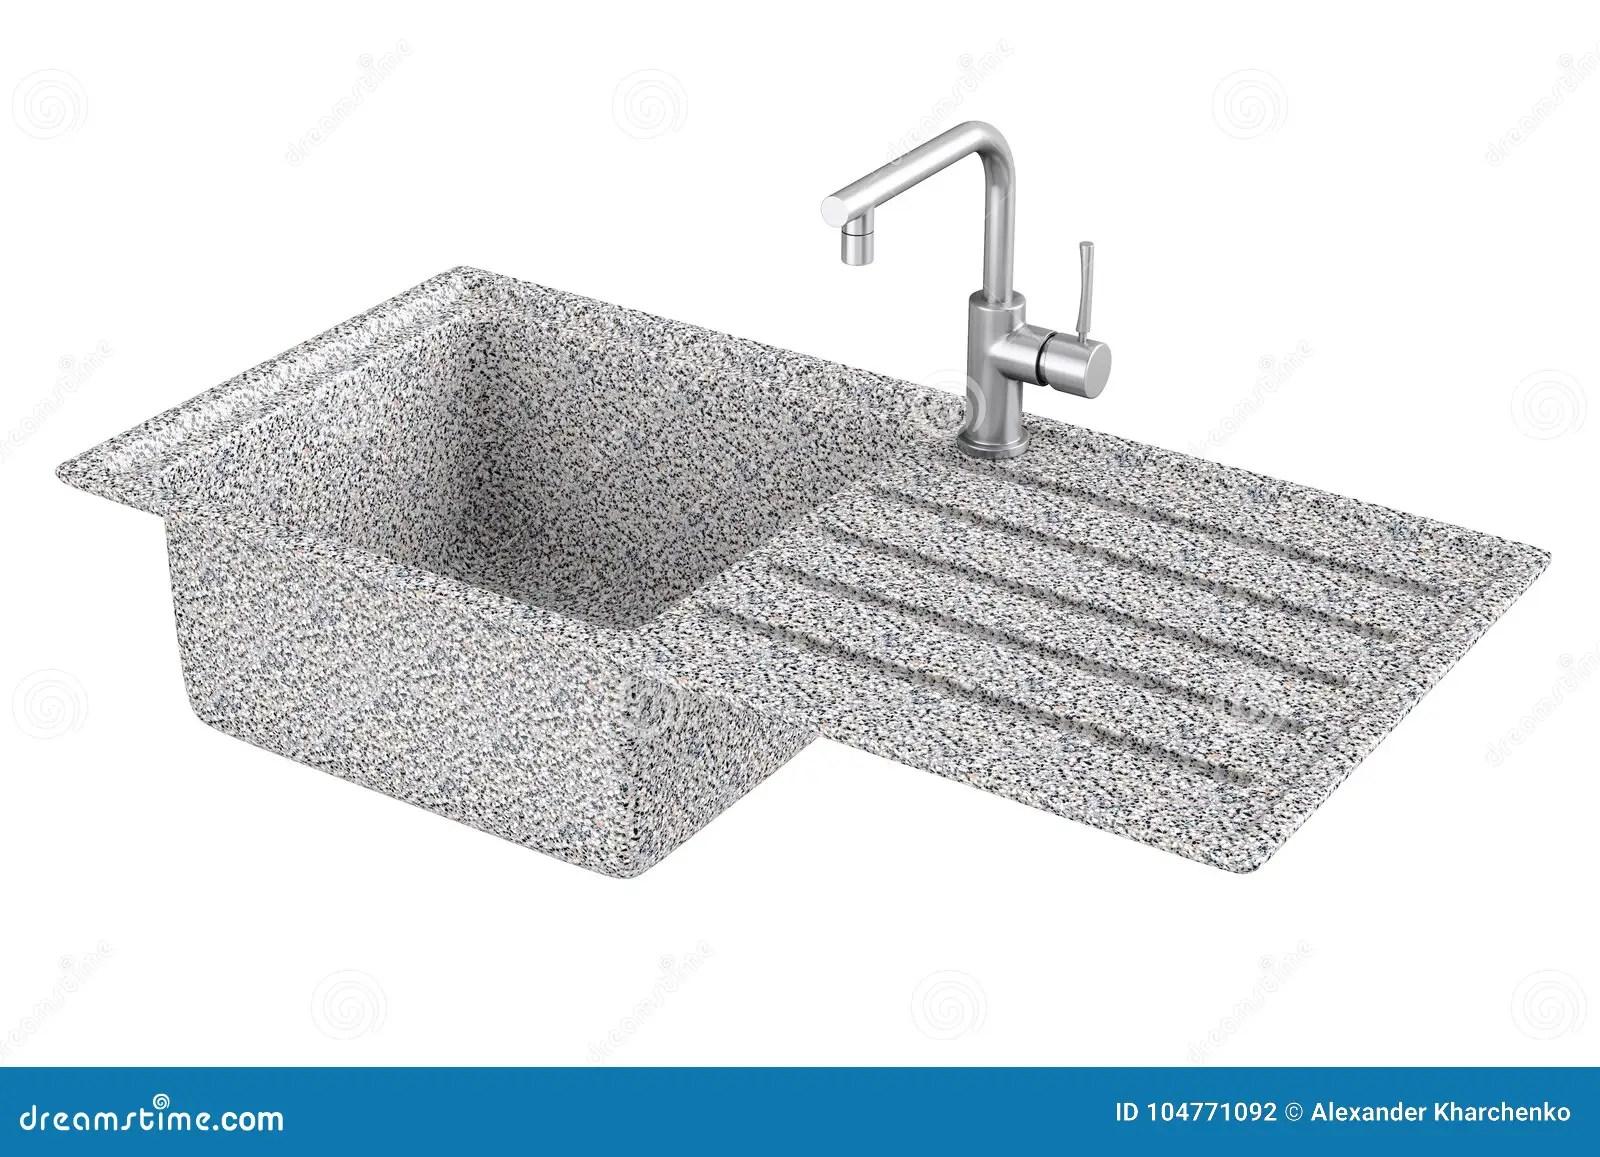 slate kitchen faucet home styles americana island 与不锈钢水龙头 fauc的现代花岗岩厨房水槽库存例证 插画包括有设计 fauc的现代花岗岩厨房水槽